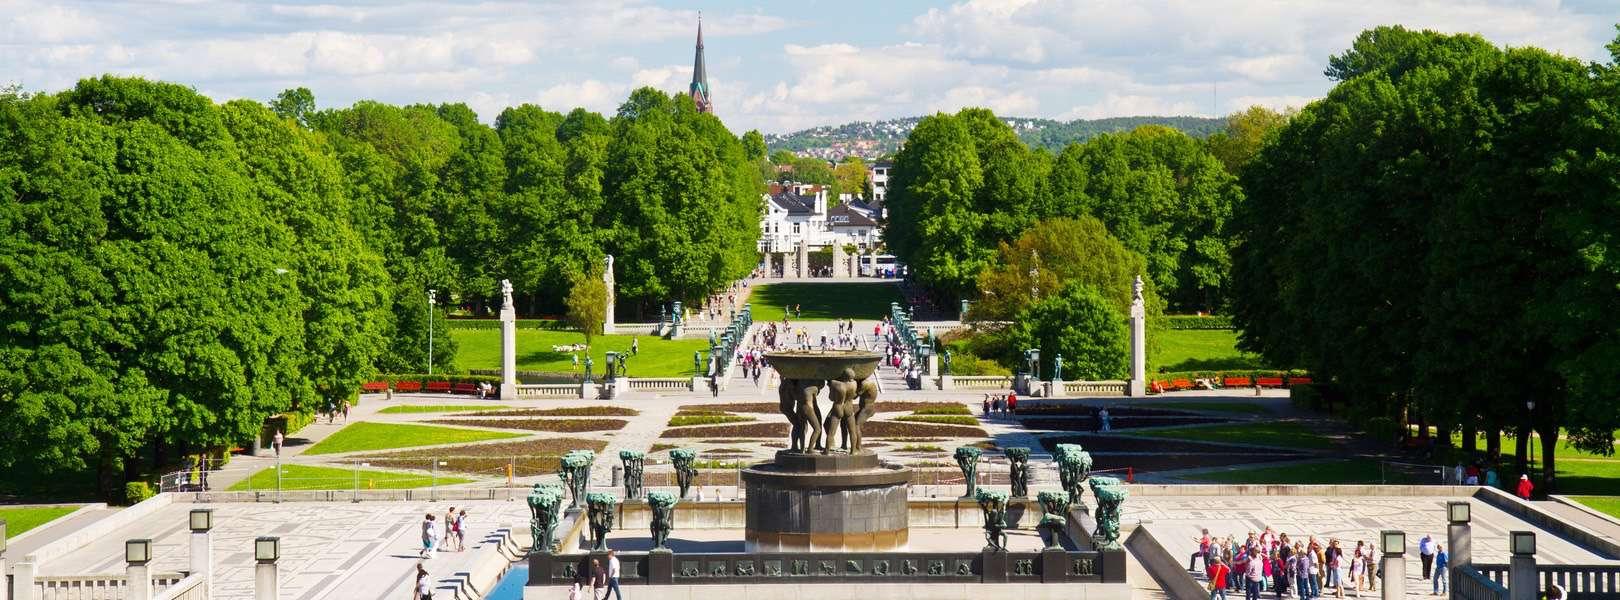 Blick über den Vigeland Skulpturenpark bzw. Vigilant in Oslo